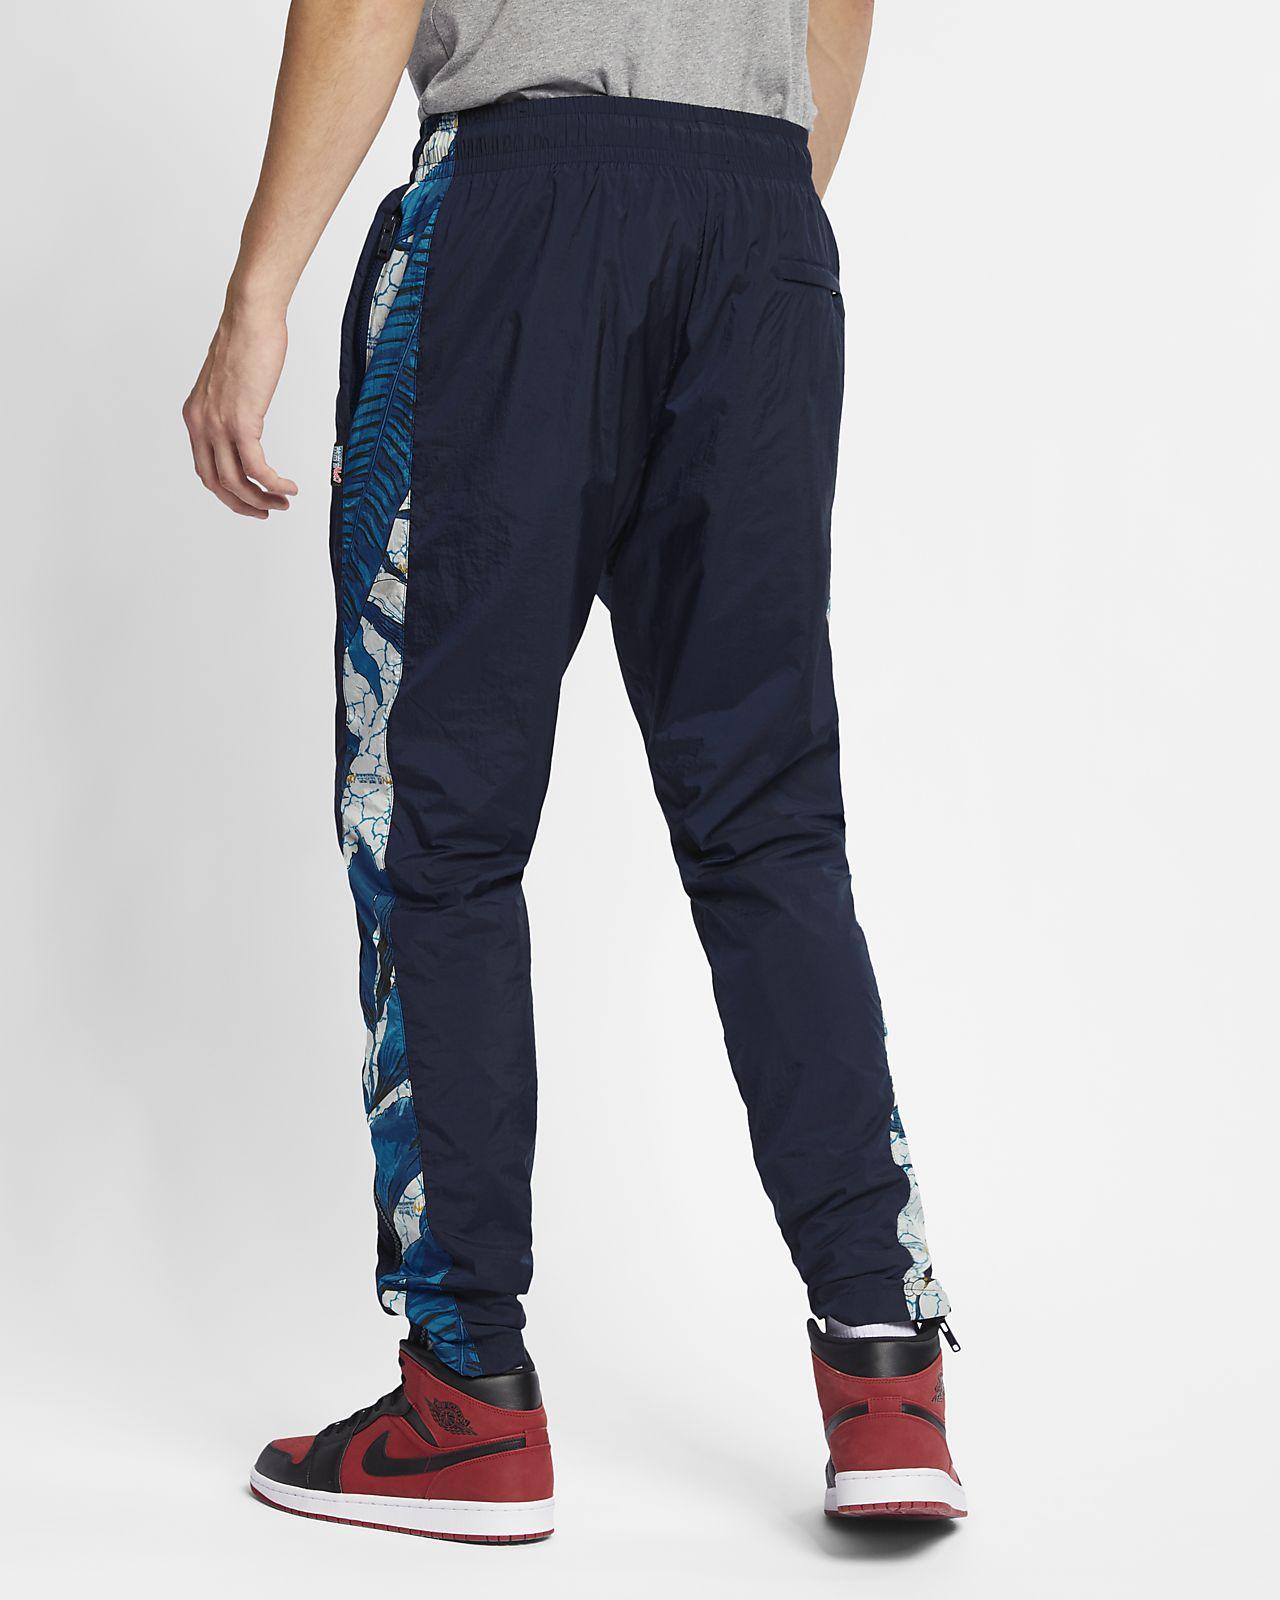 dba58d21c6c41c Jordan x RW Flight Men s Trousers. Nike.com GB